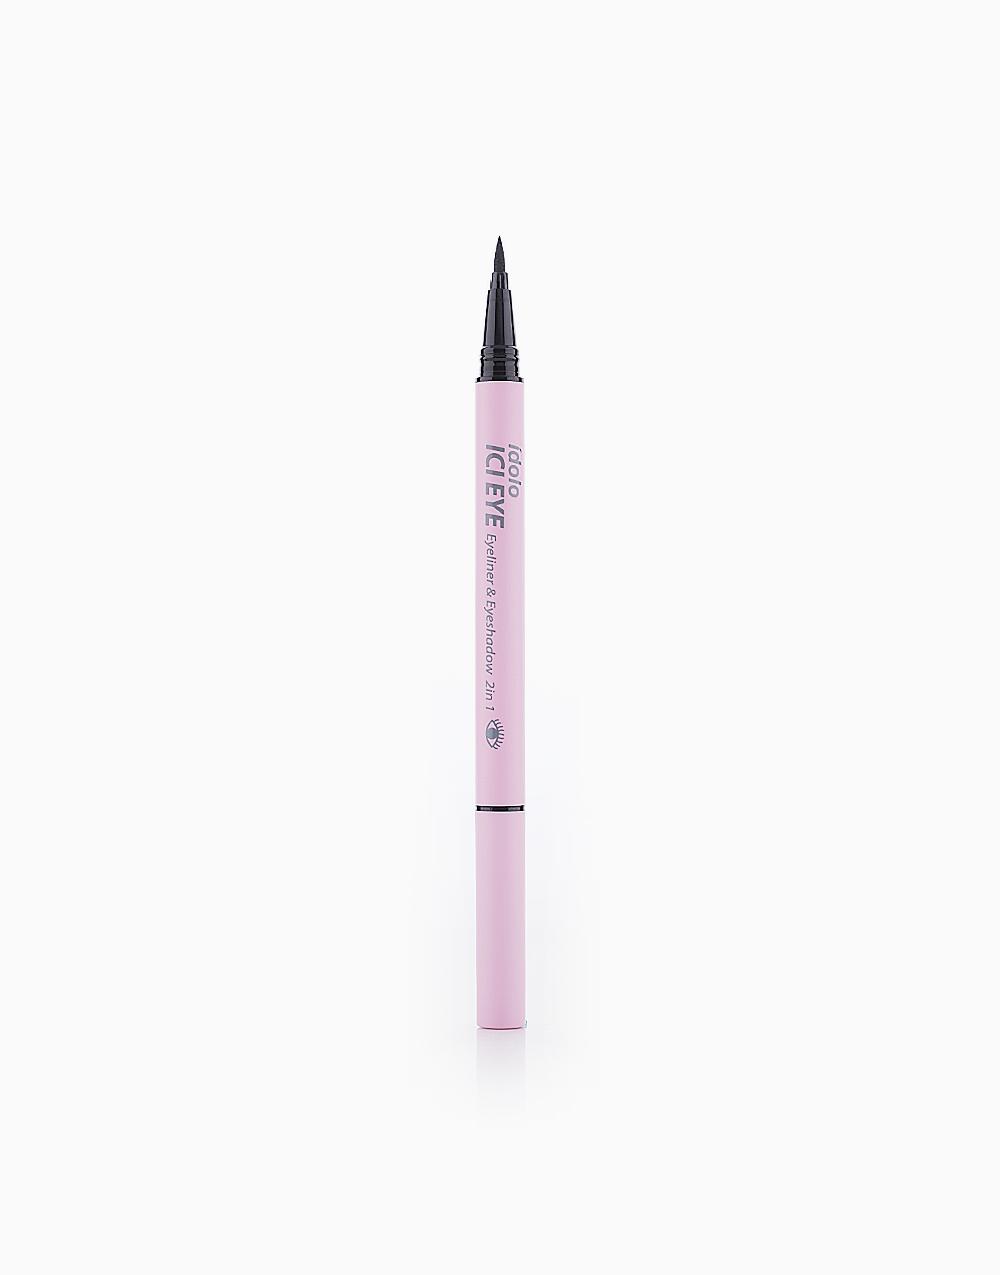 Idolo Ici Eye 2-in-1 Eyeliner & Eyeshadow by Mistine   Pink